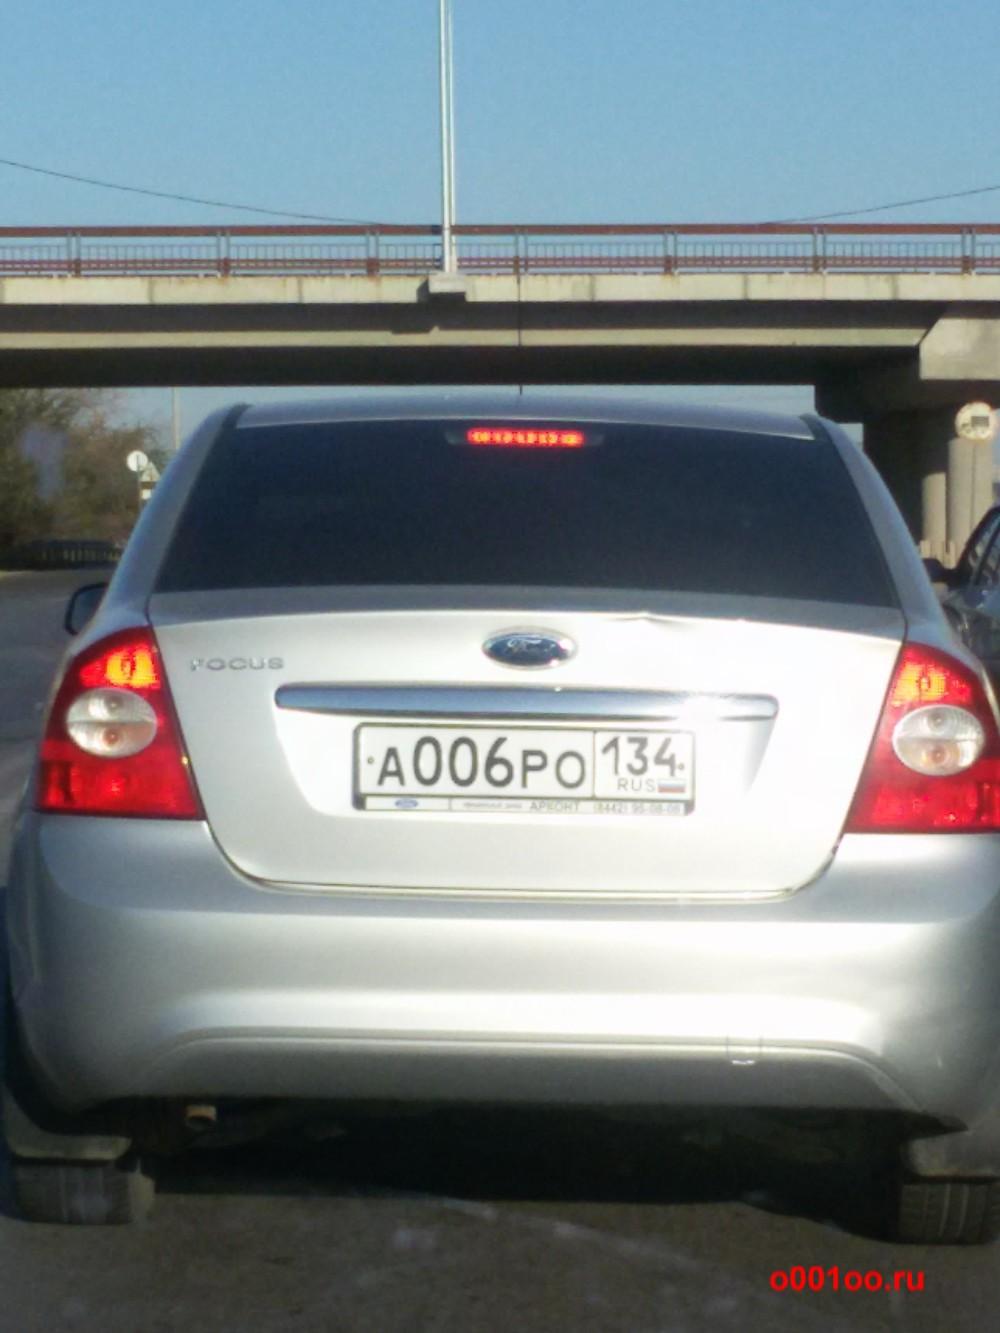 а006ро134